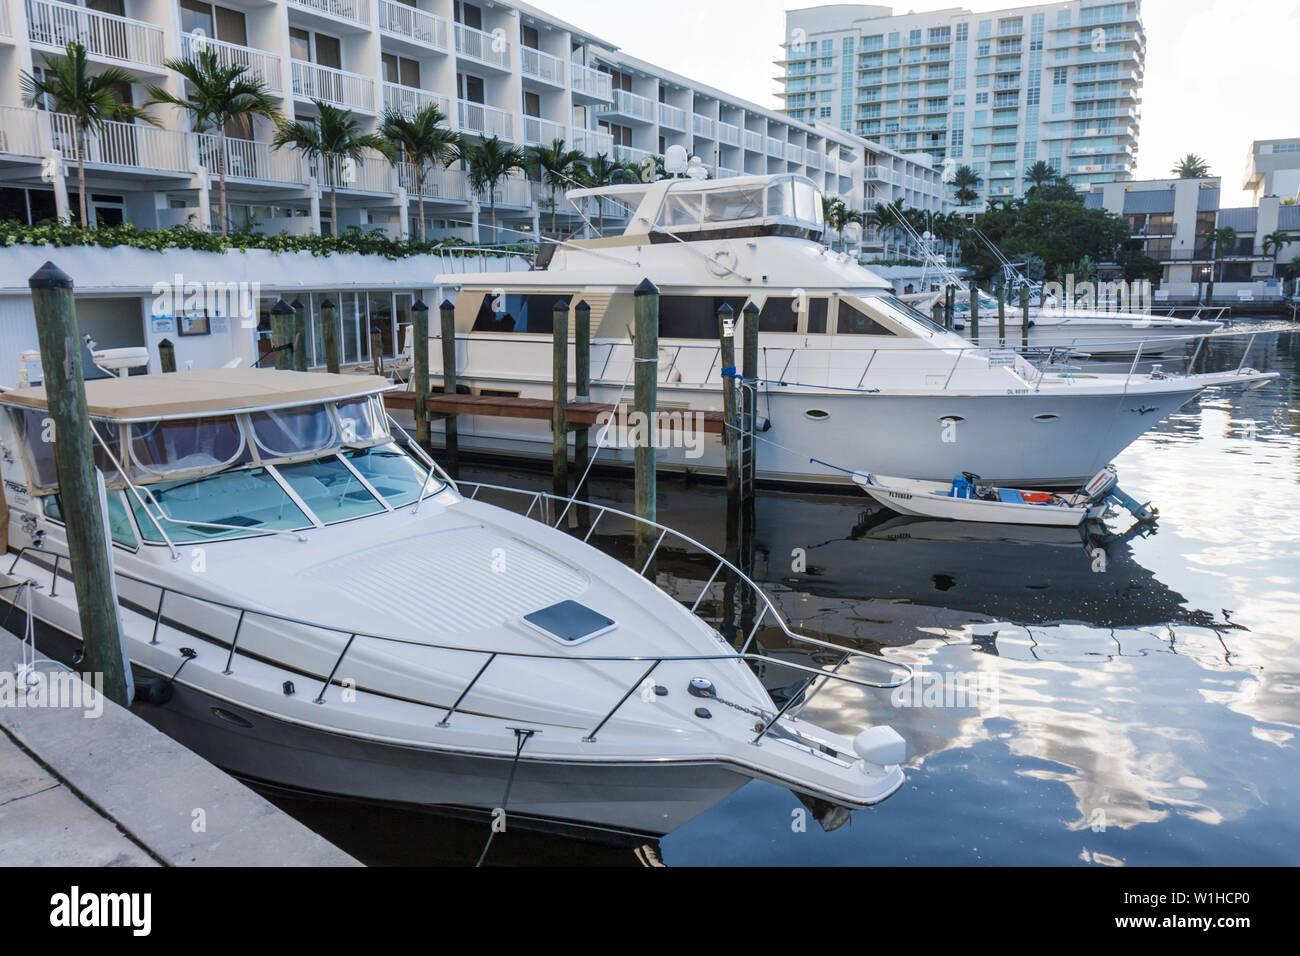 Fort Lauderdale Ft. Florida Hilton Fort Lauderdale Marina hotel Portside Marina boating yacht cabin cruiser dock berth dingy bui - Stock Image